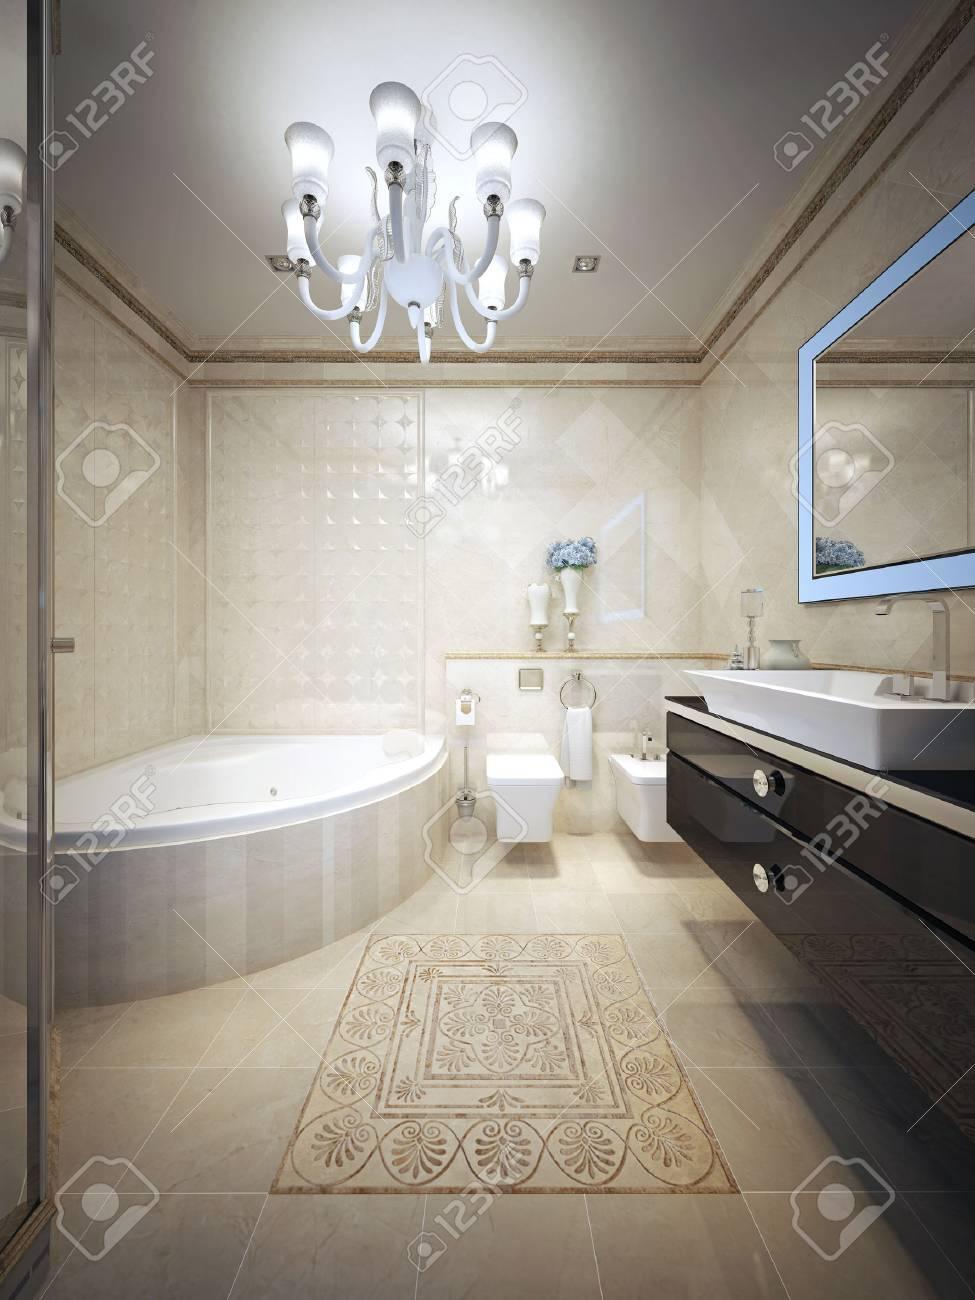 Cuarto de baño de estilo vanguardista. 3d